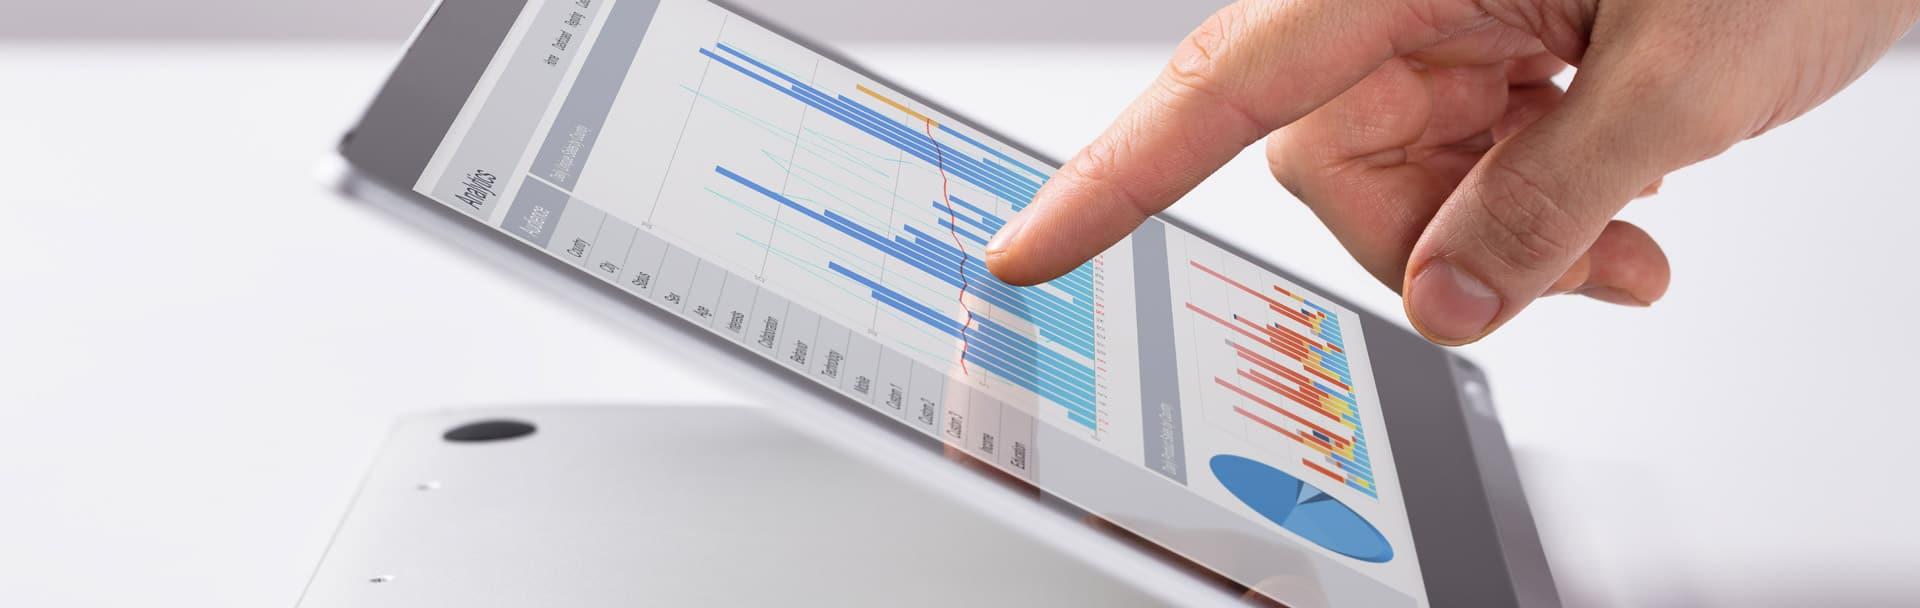 BI-dashboard: wat jij wilt bouwen vs wat de business wil zien - Hot ITem